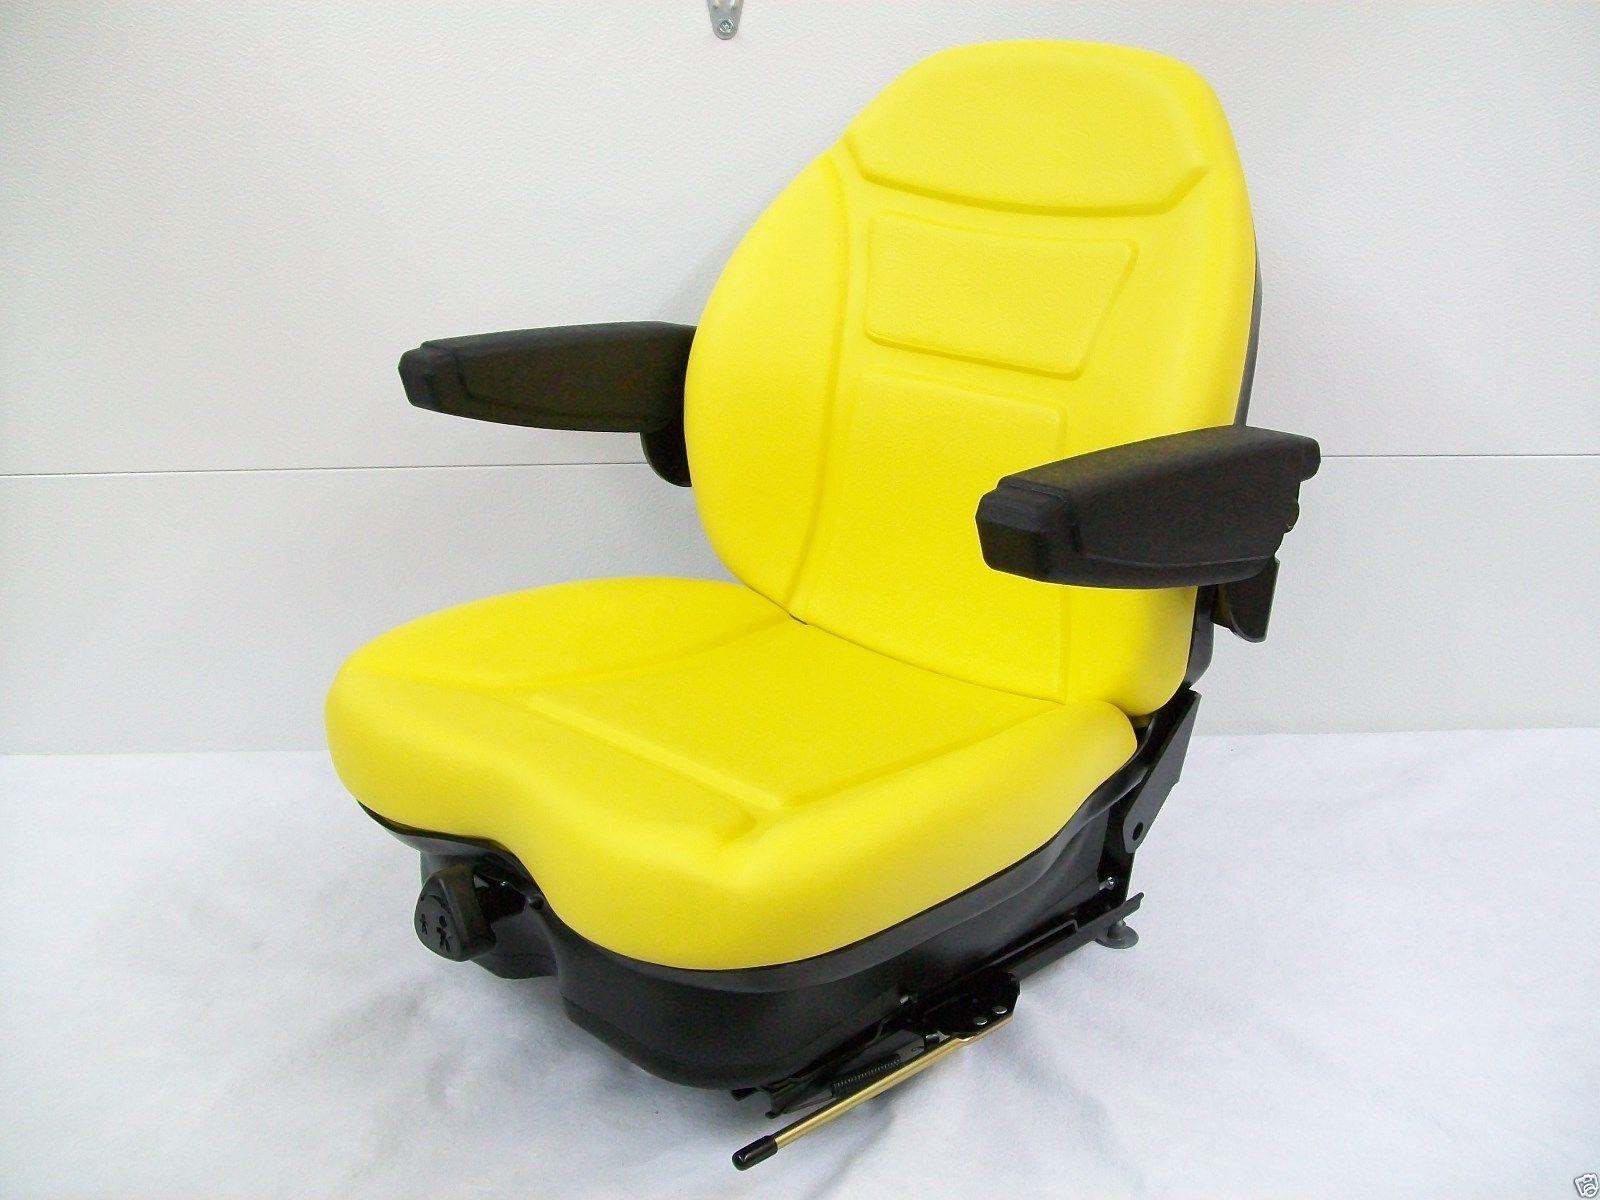 With John Deere Seats Contorls : Yellow suspension seat jd john deere front mower turf